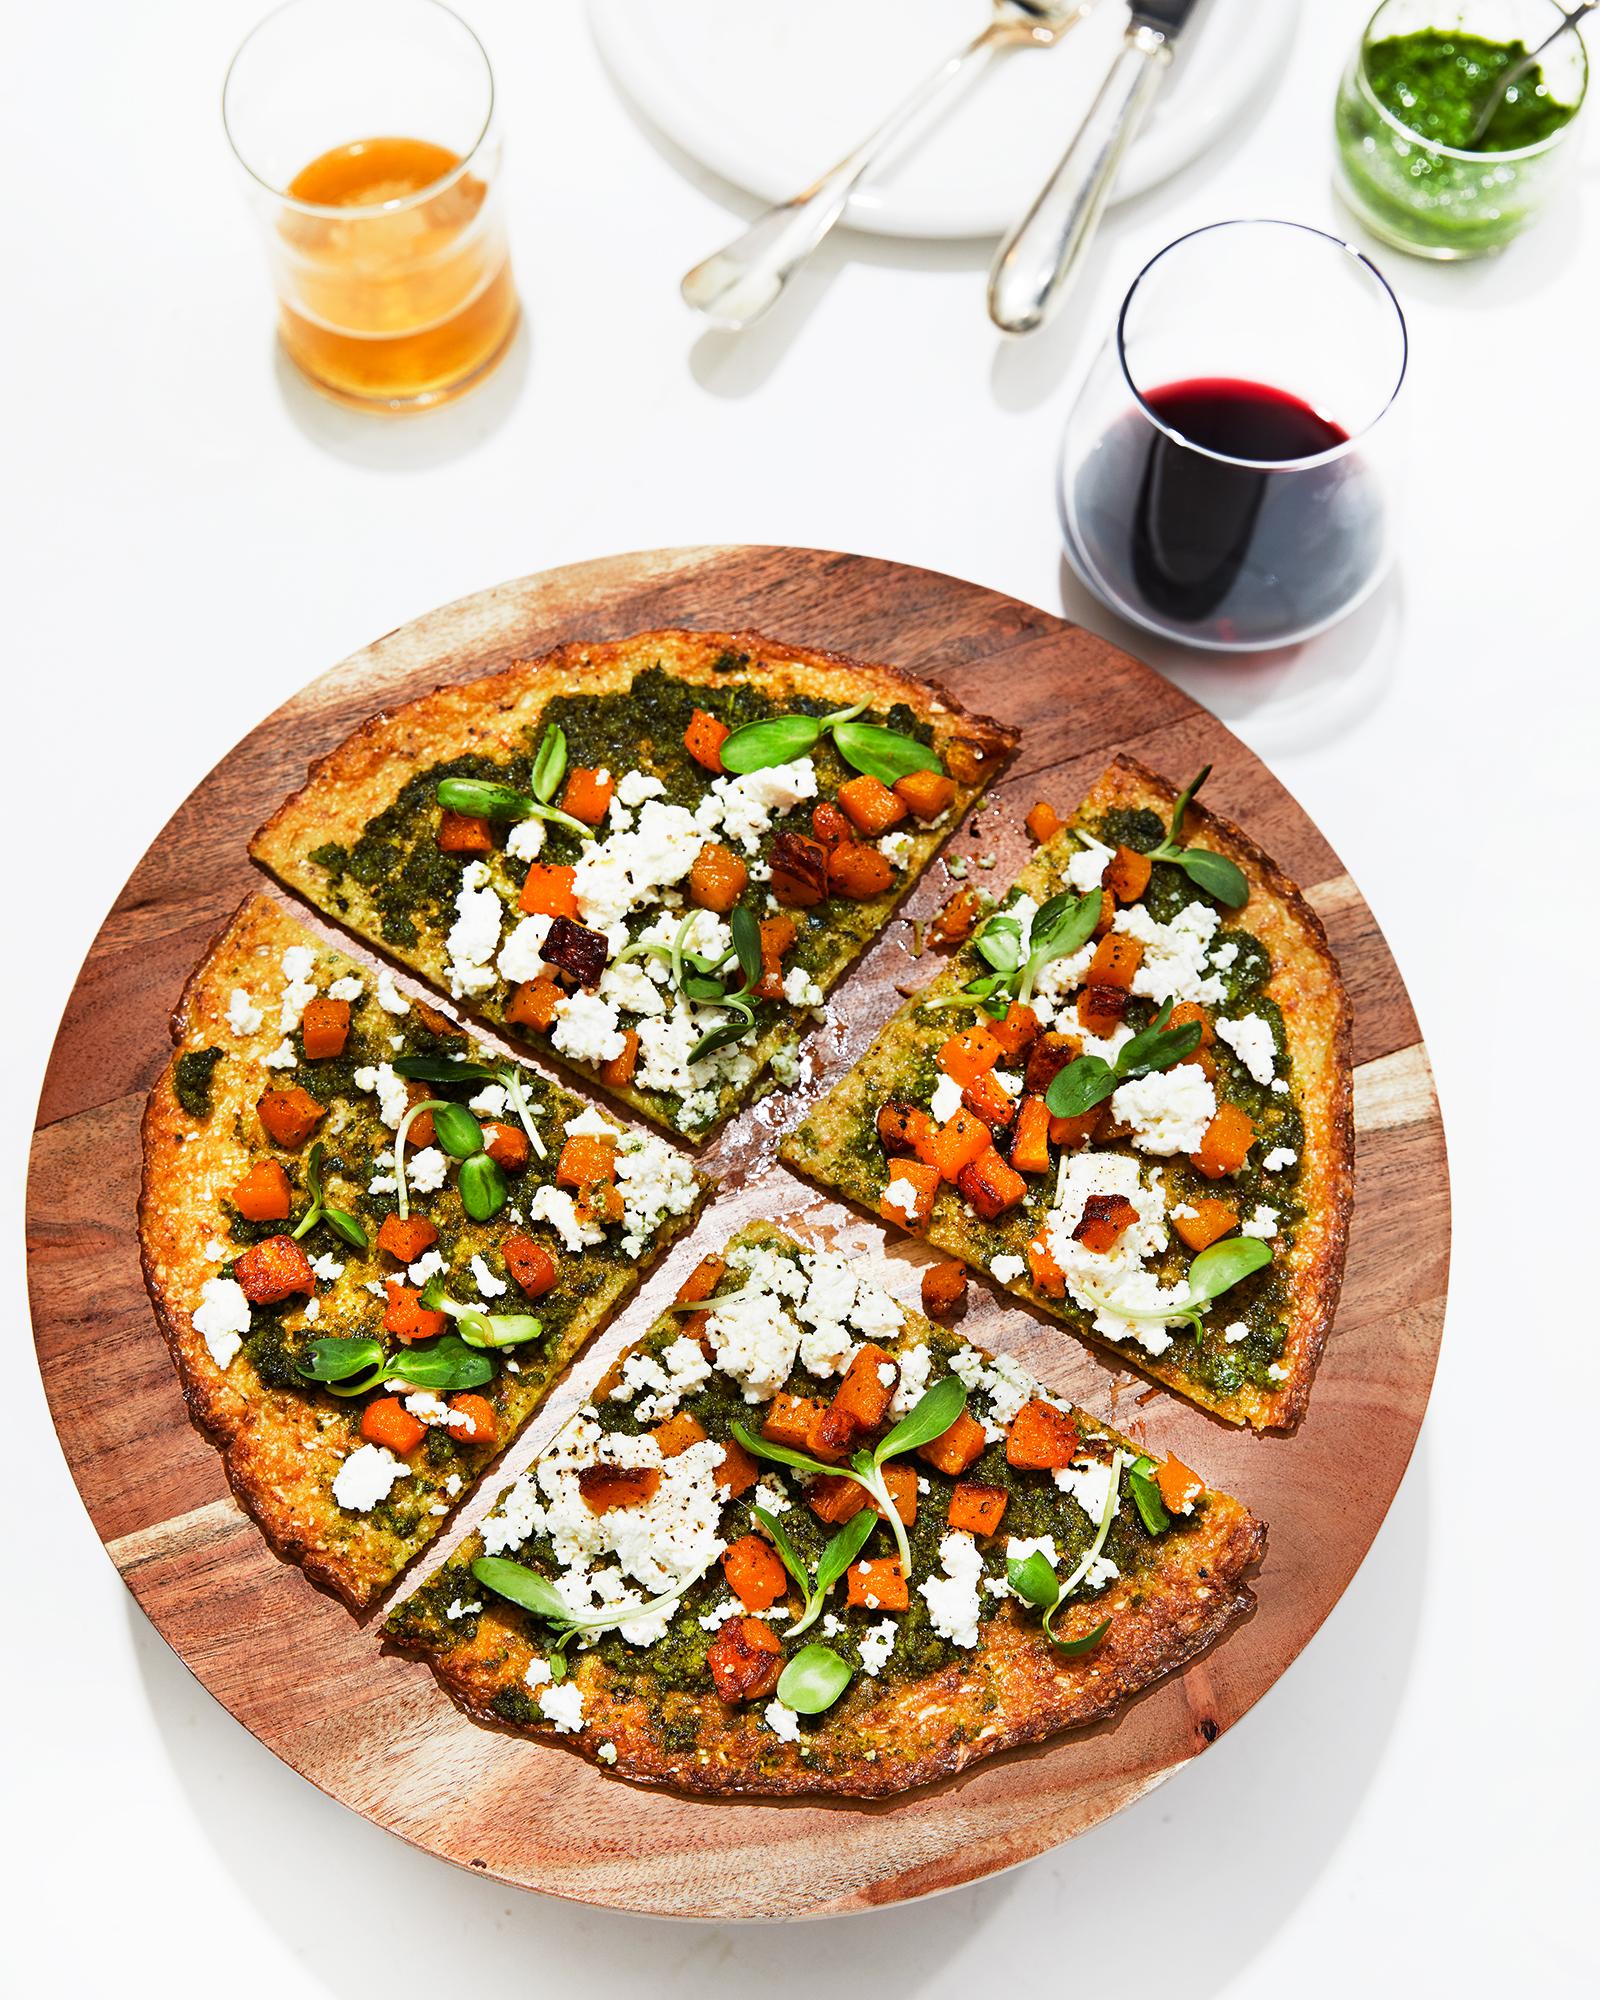 Fall-Menu_Butternut-Squash-Cauliflower-Pizza-0068.jpg